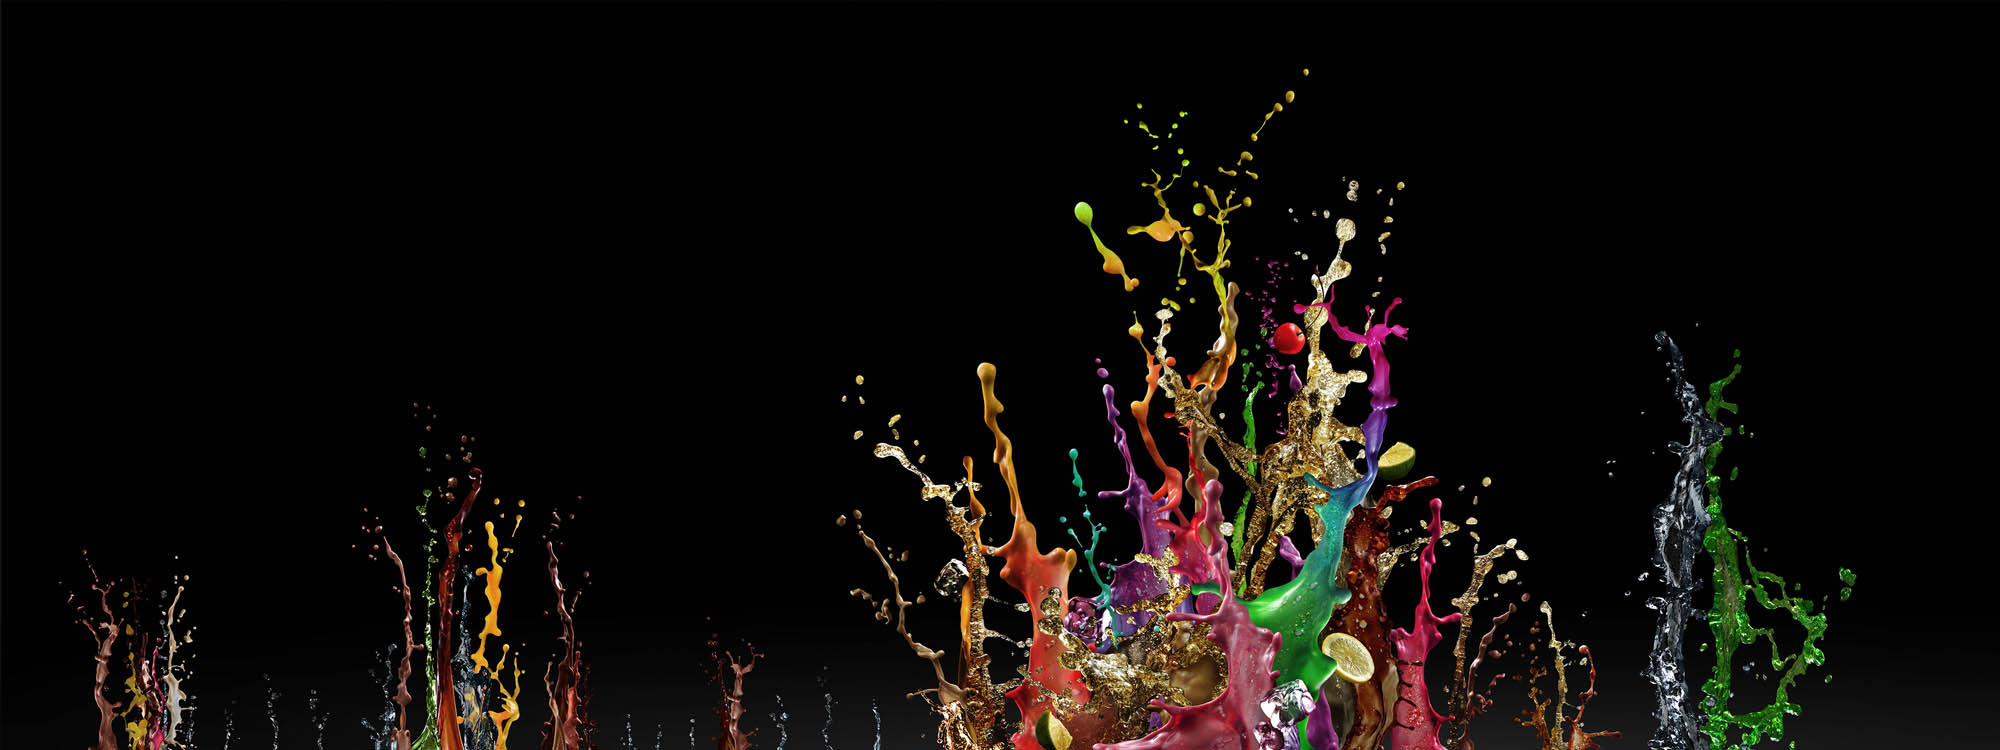 Splash liquid final(Resize).jpg